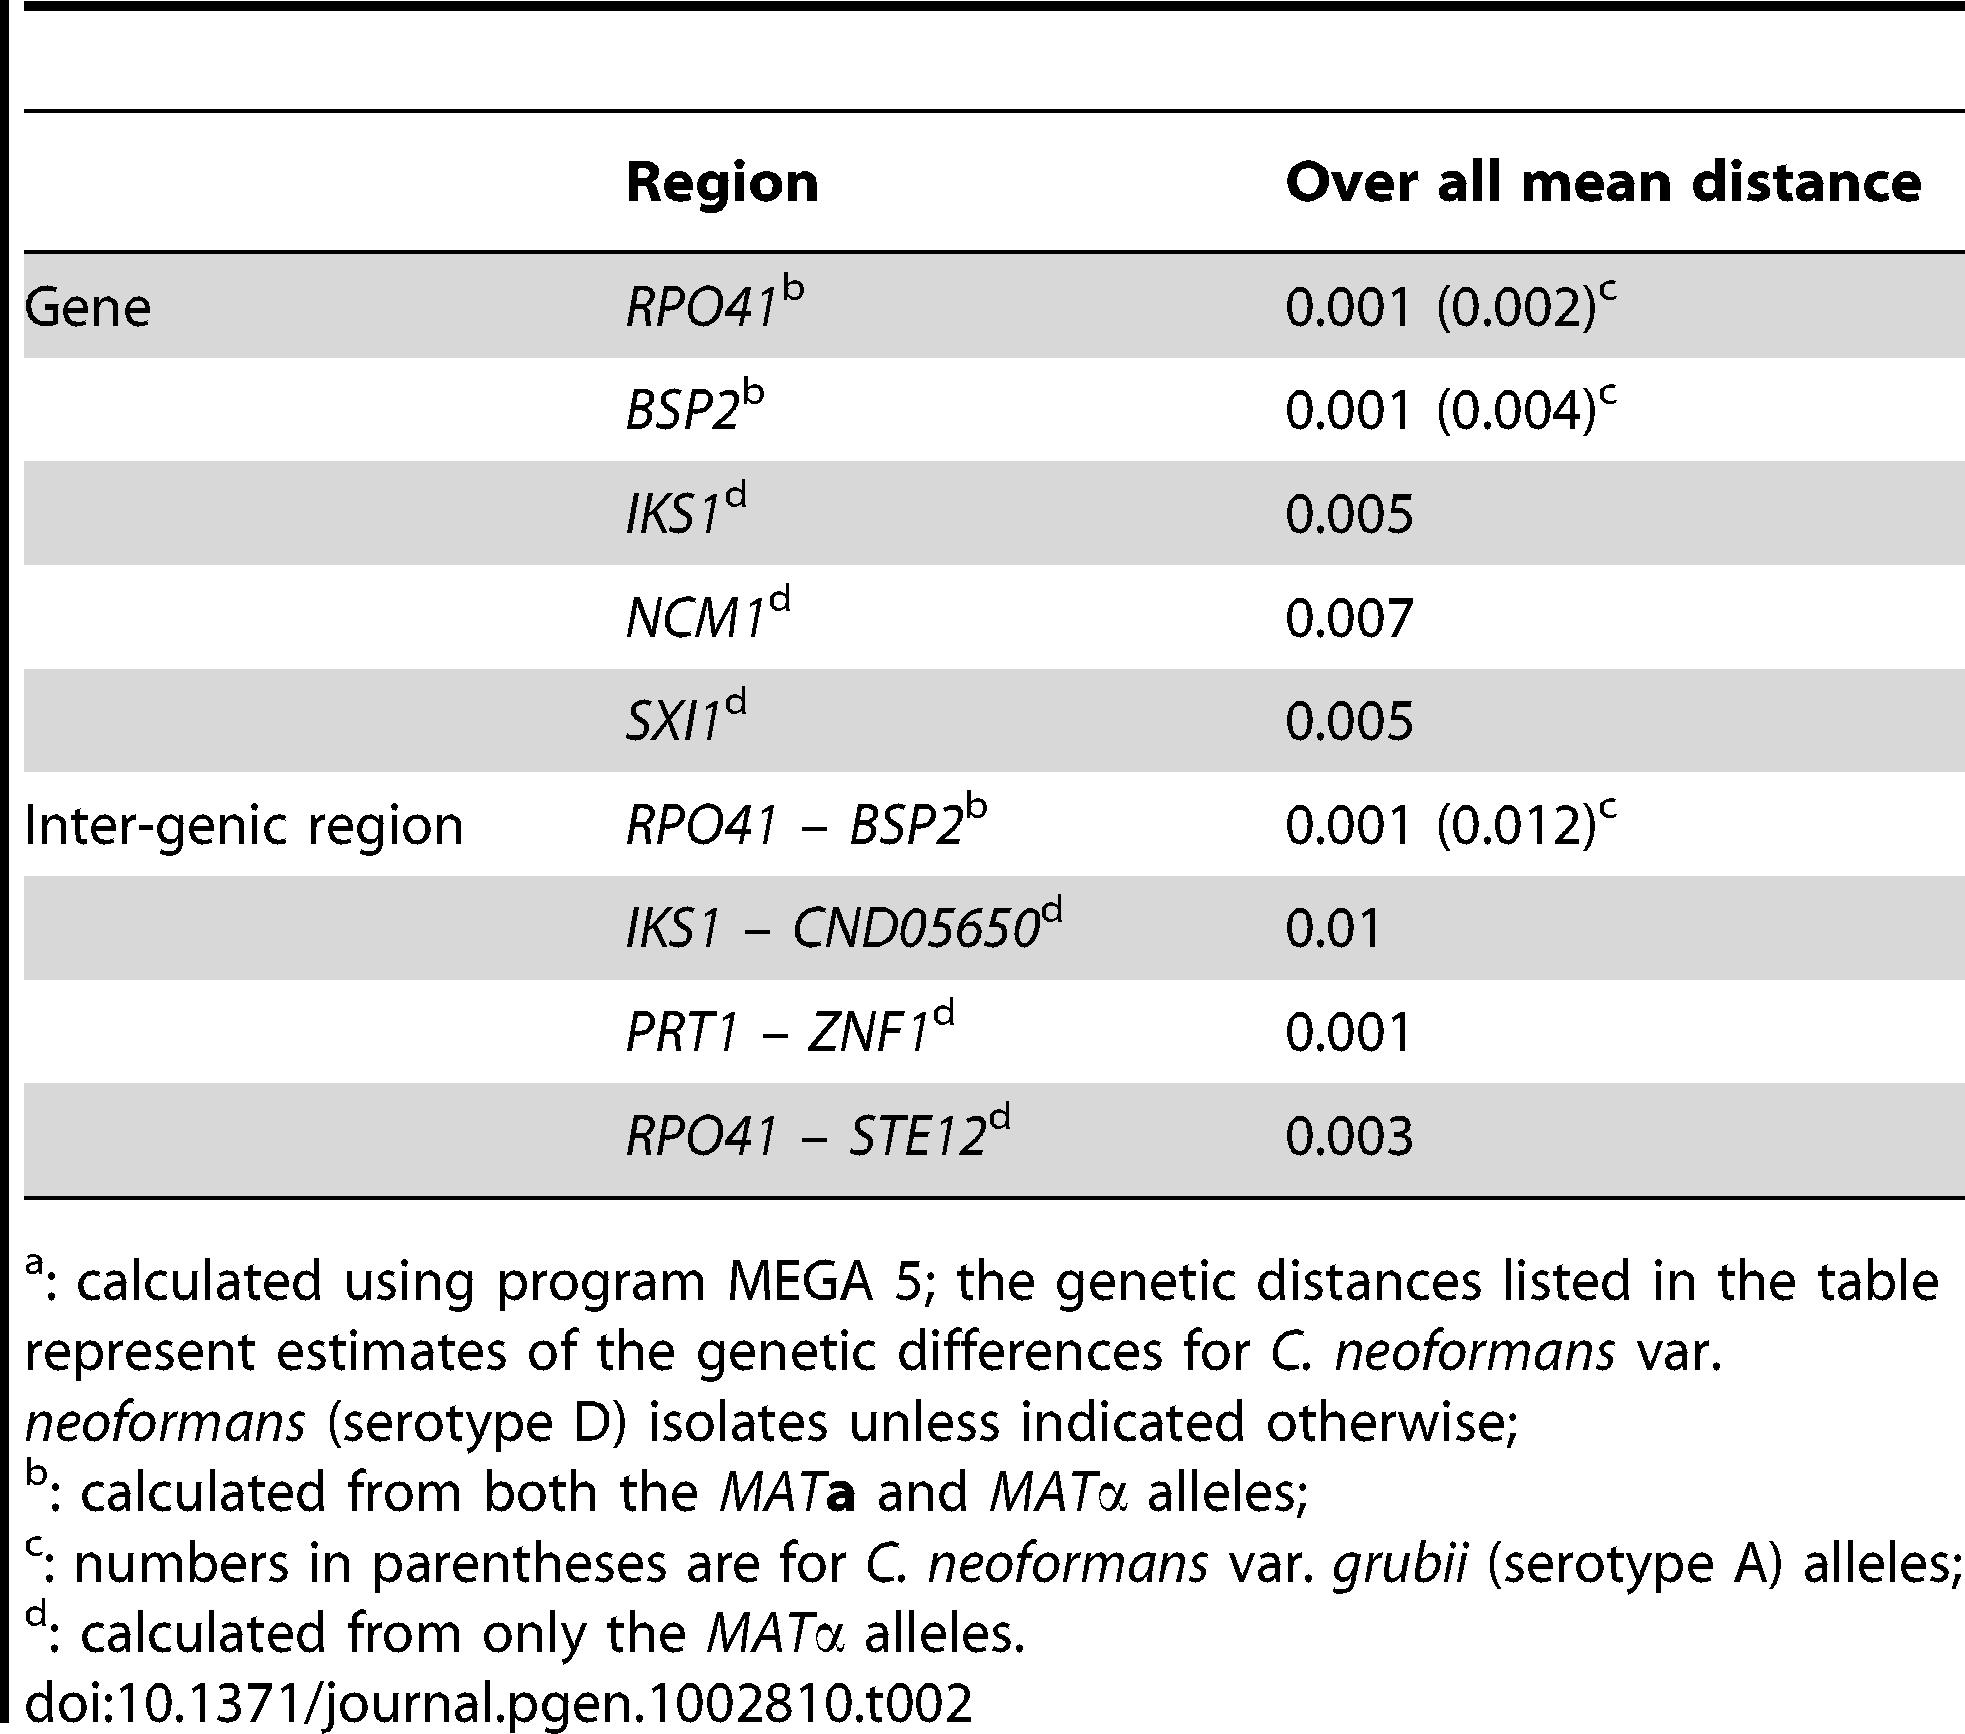 Genetic distances of different genes/regions within the <i>MAT</i> locus.<em class=&quot;ref&quot;>a</em>